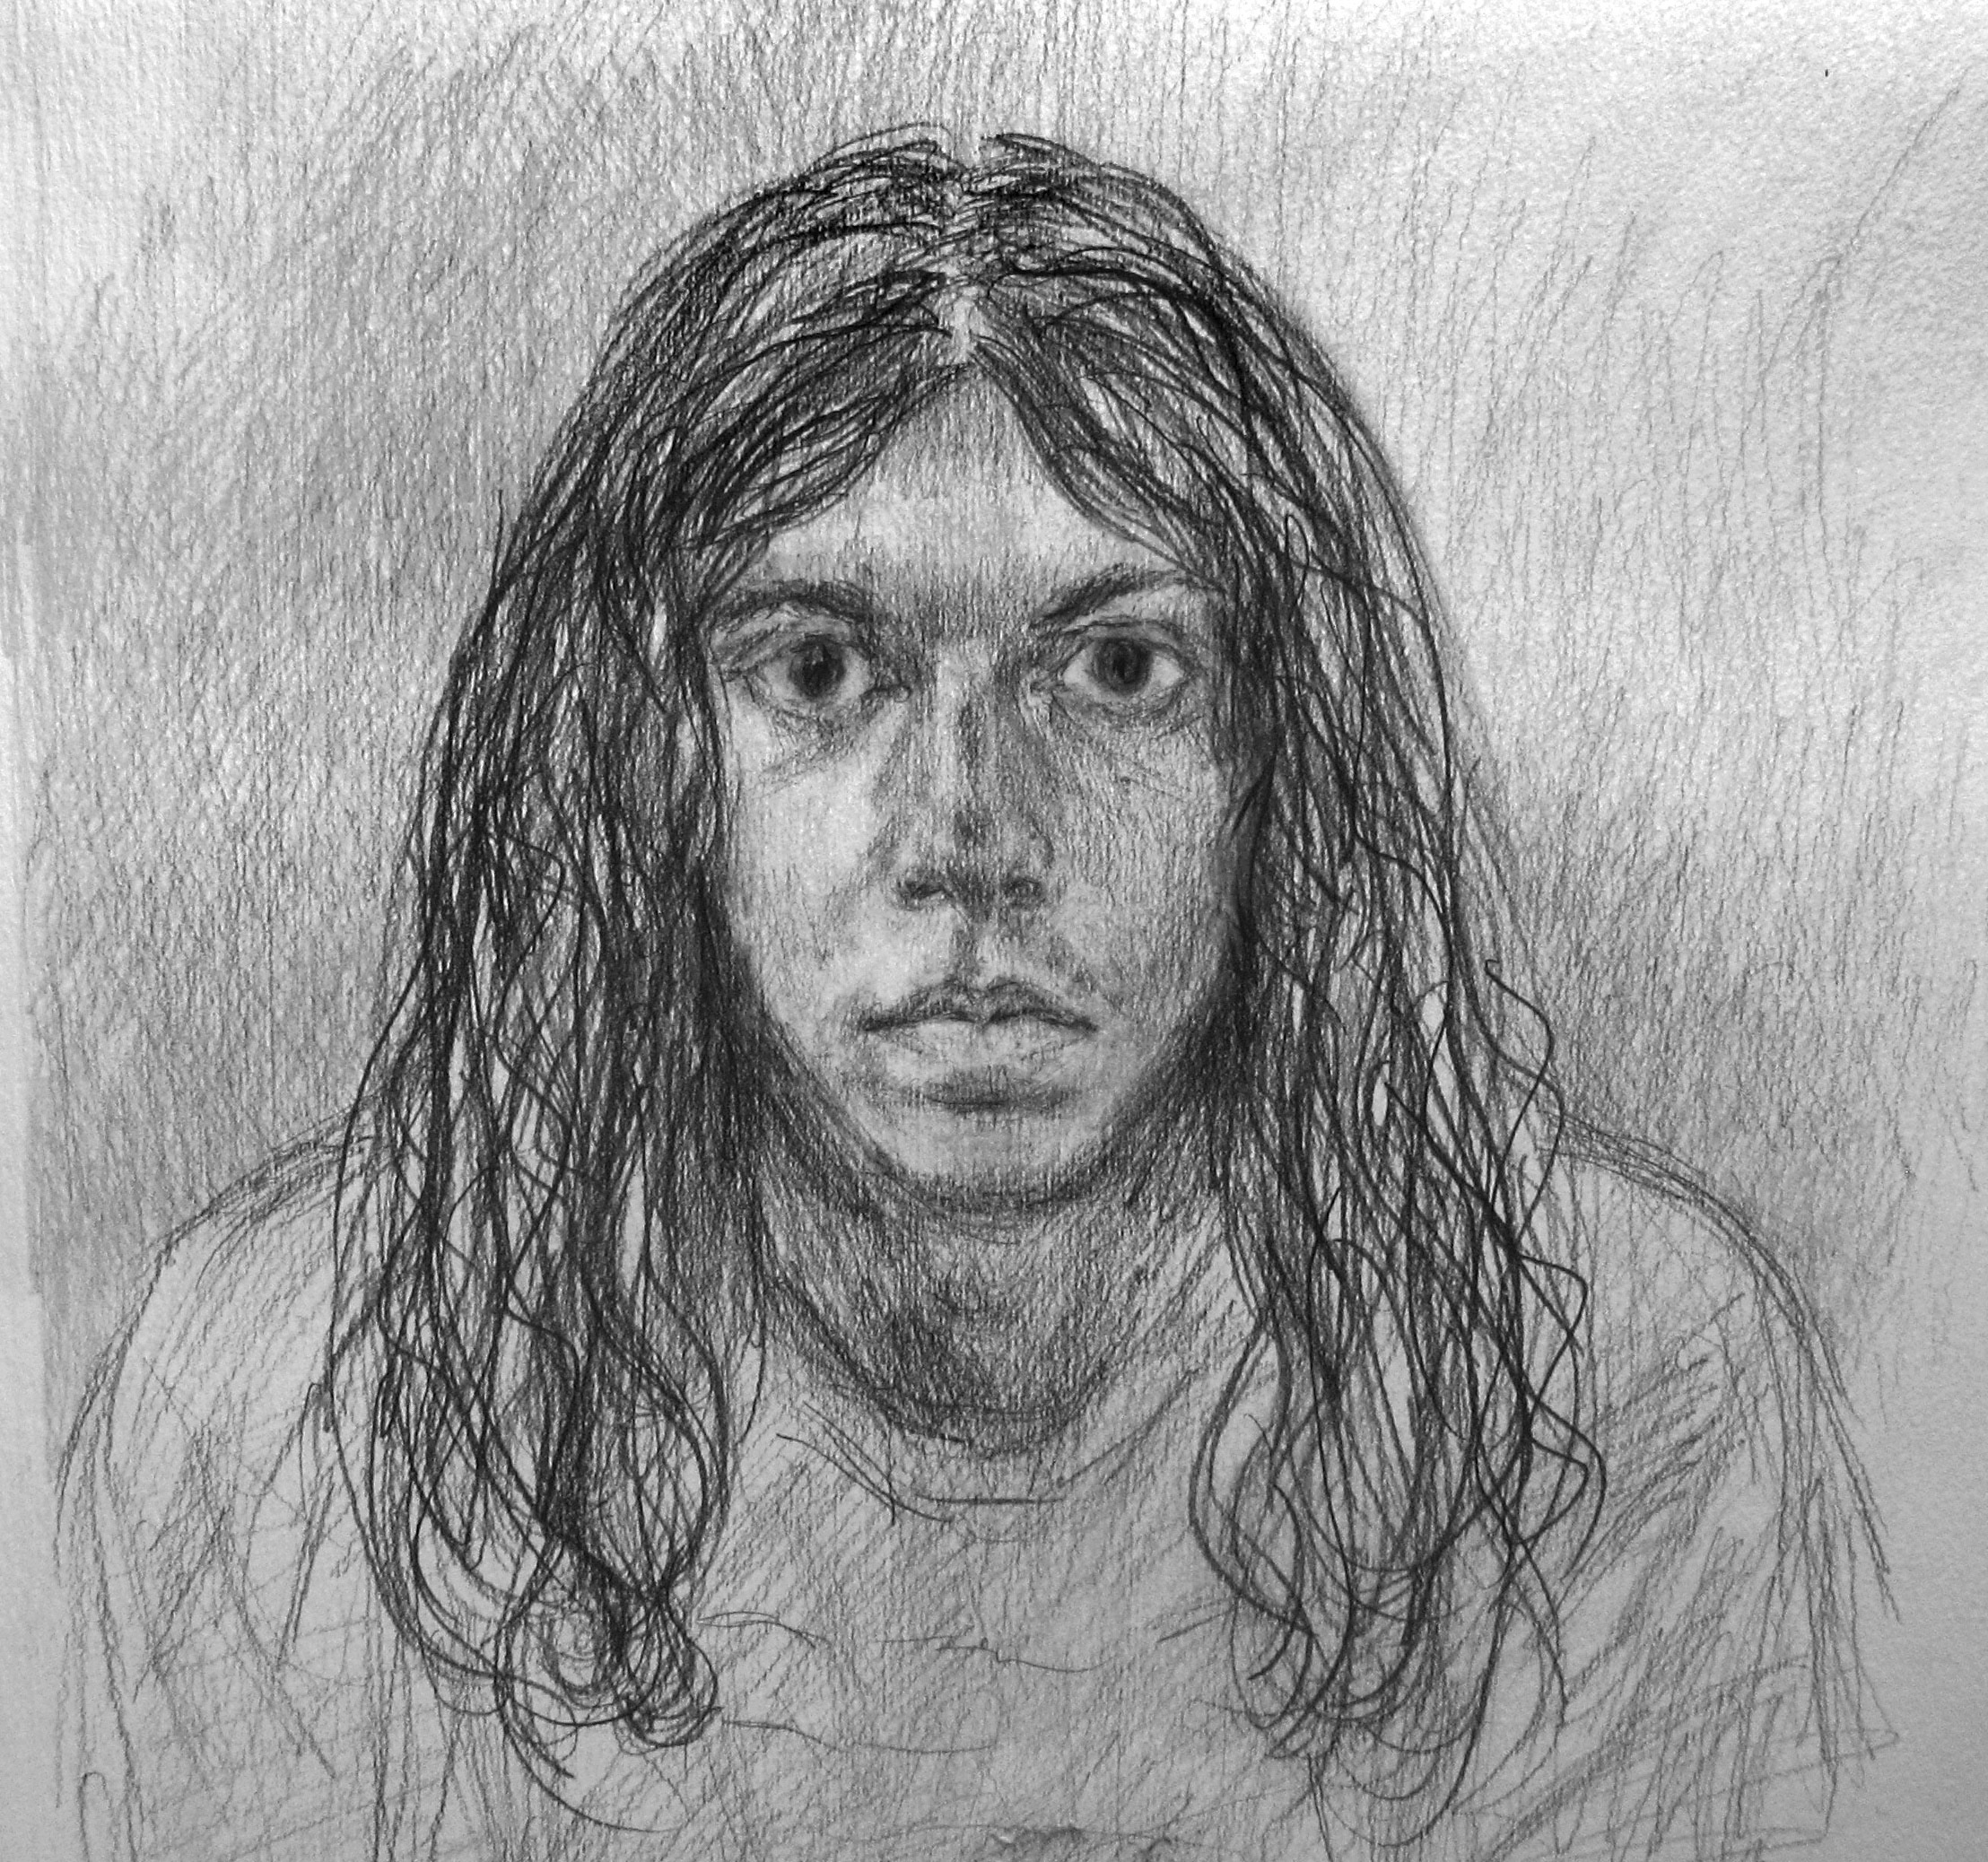 """Eduardo""2008   Pencil on paper"